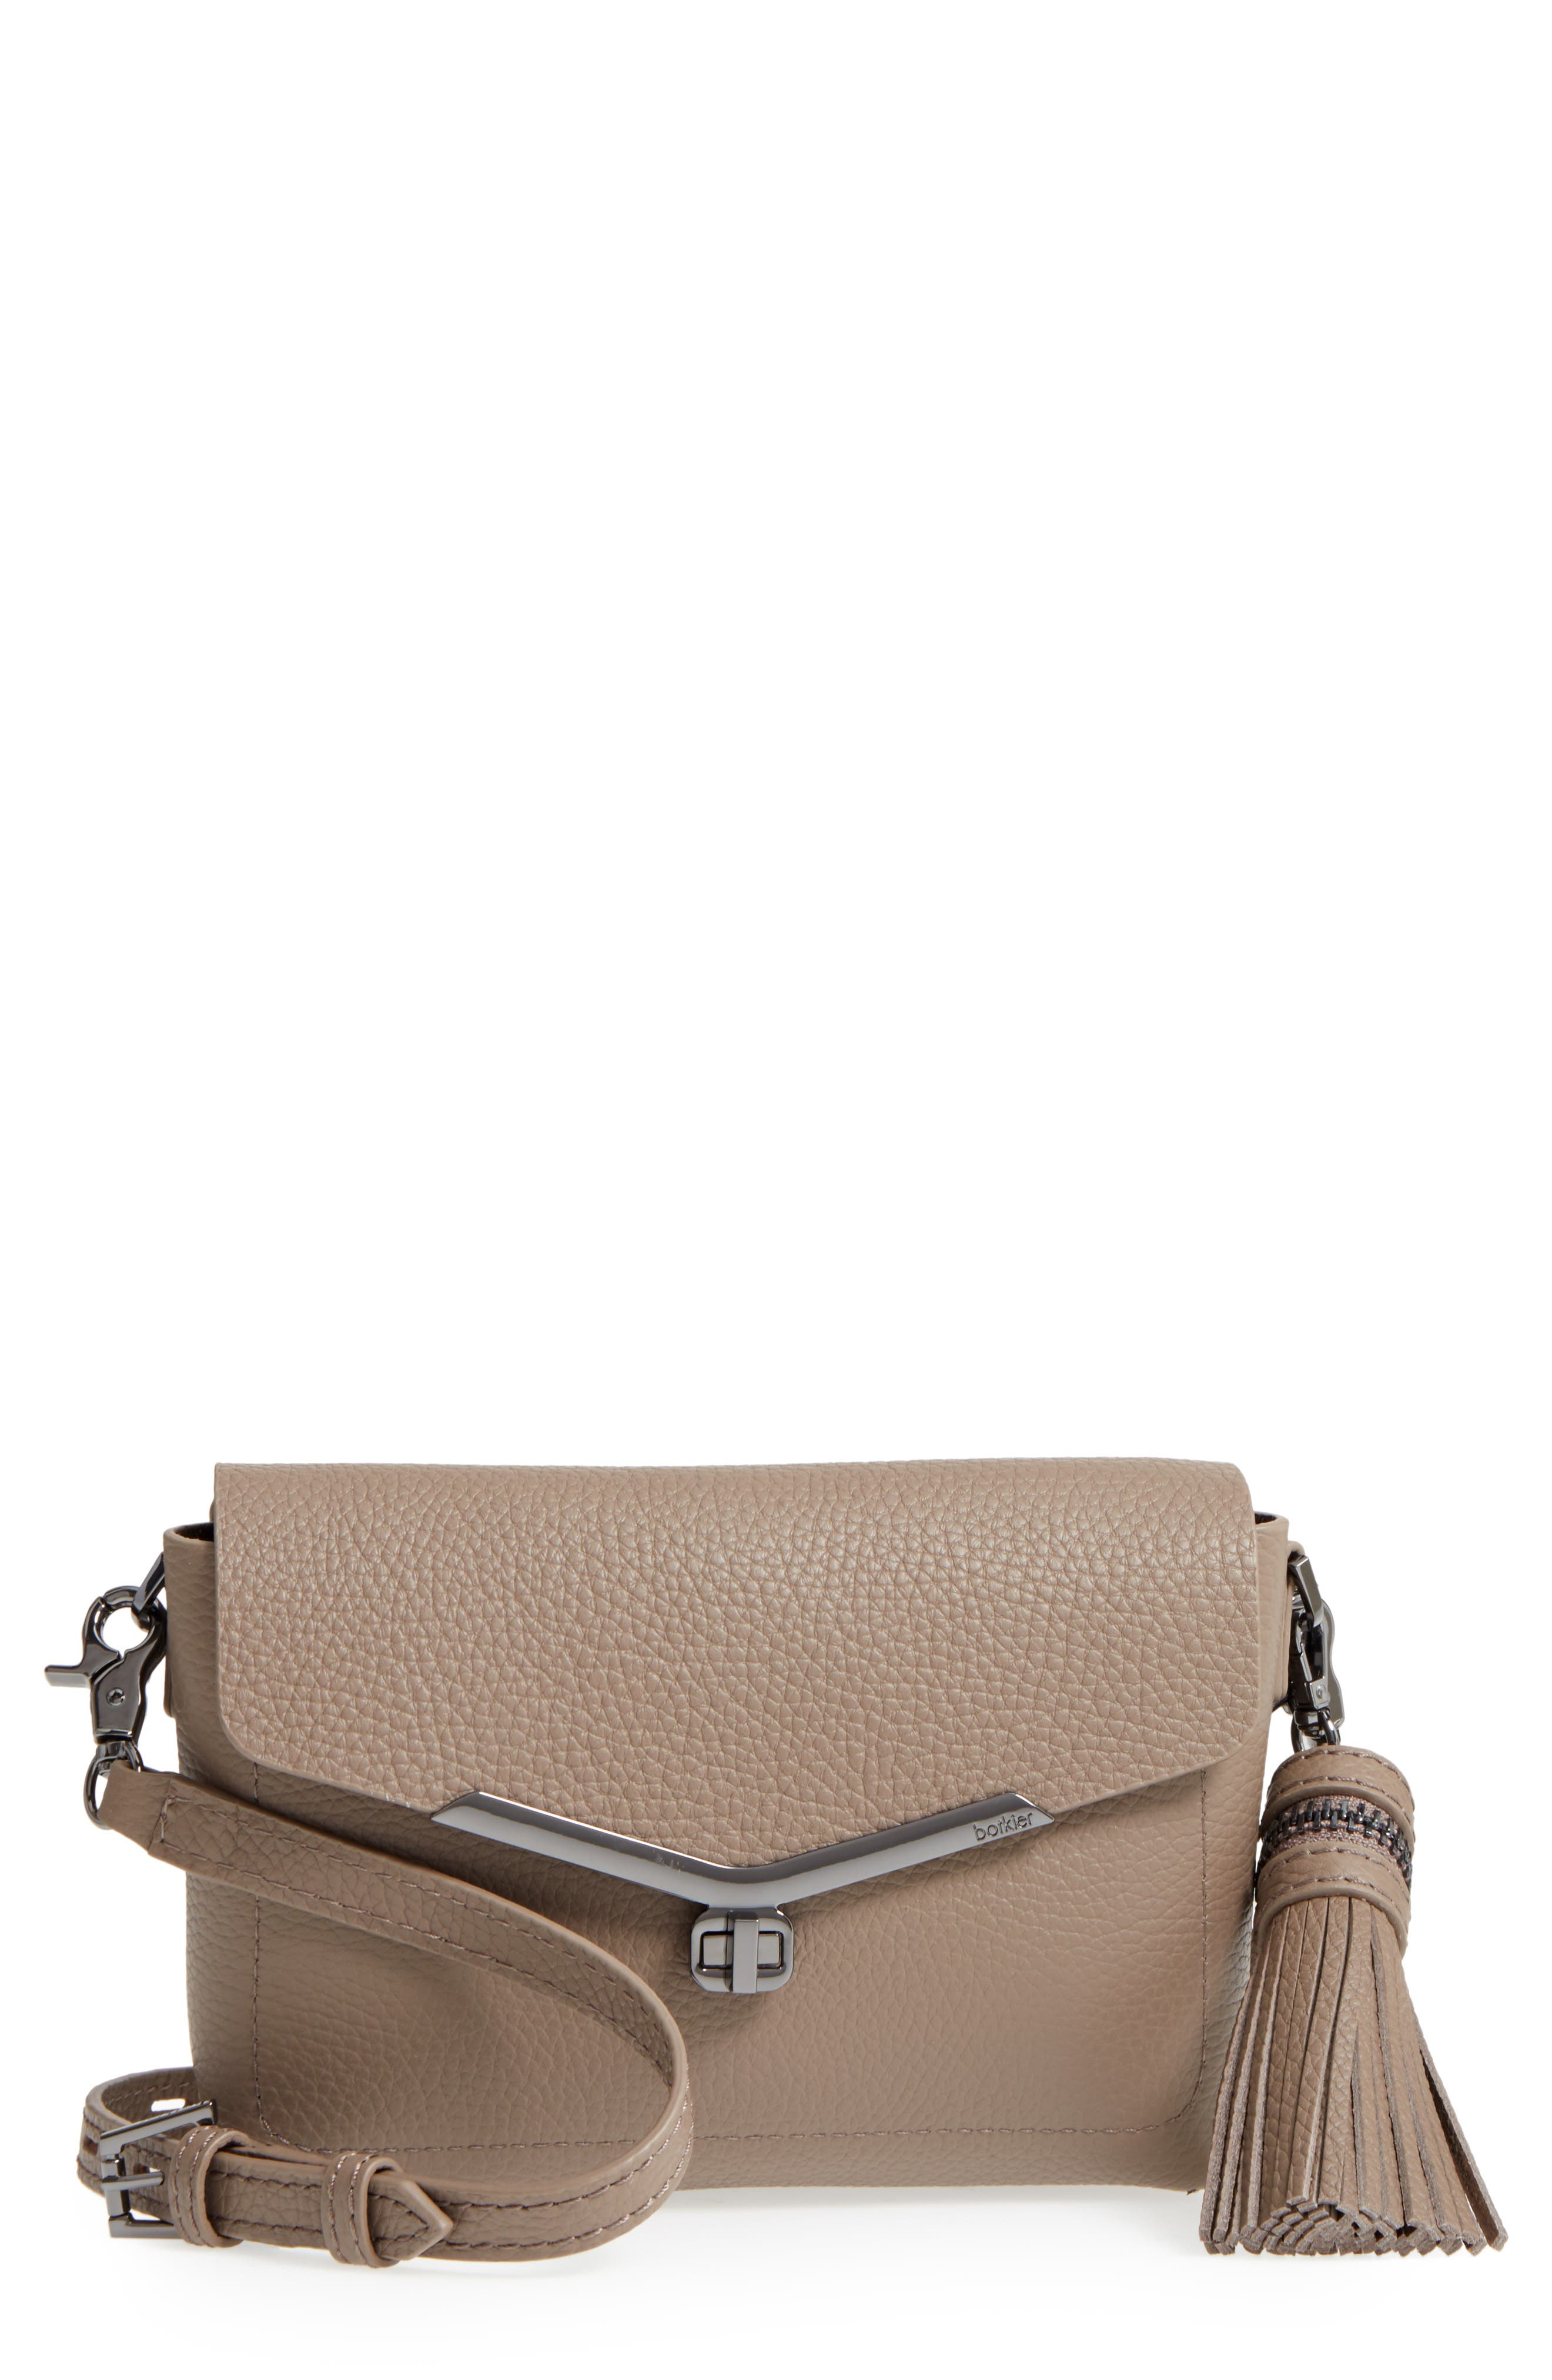 Main Image - Botkier Vivi Leather Crossbody Bag